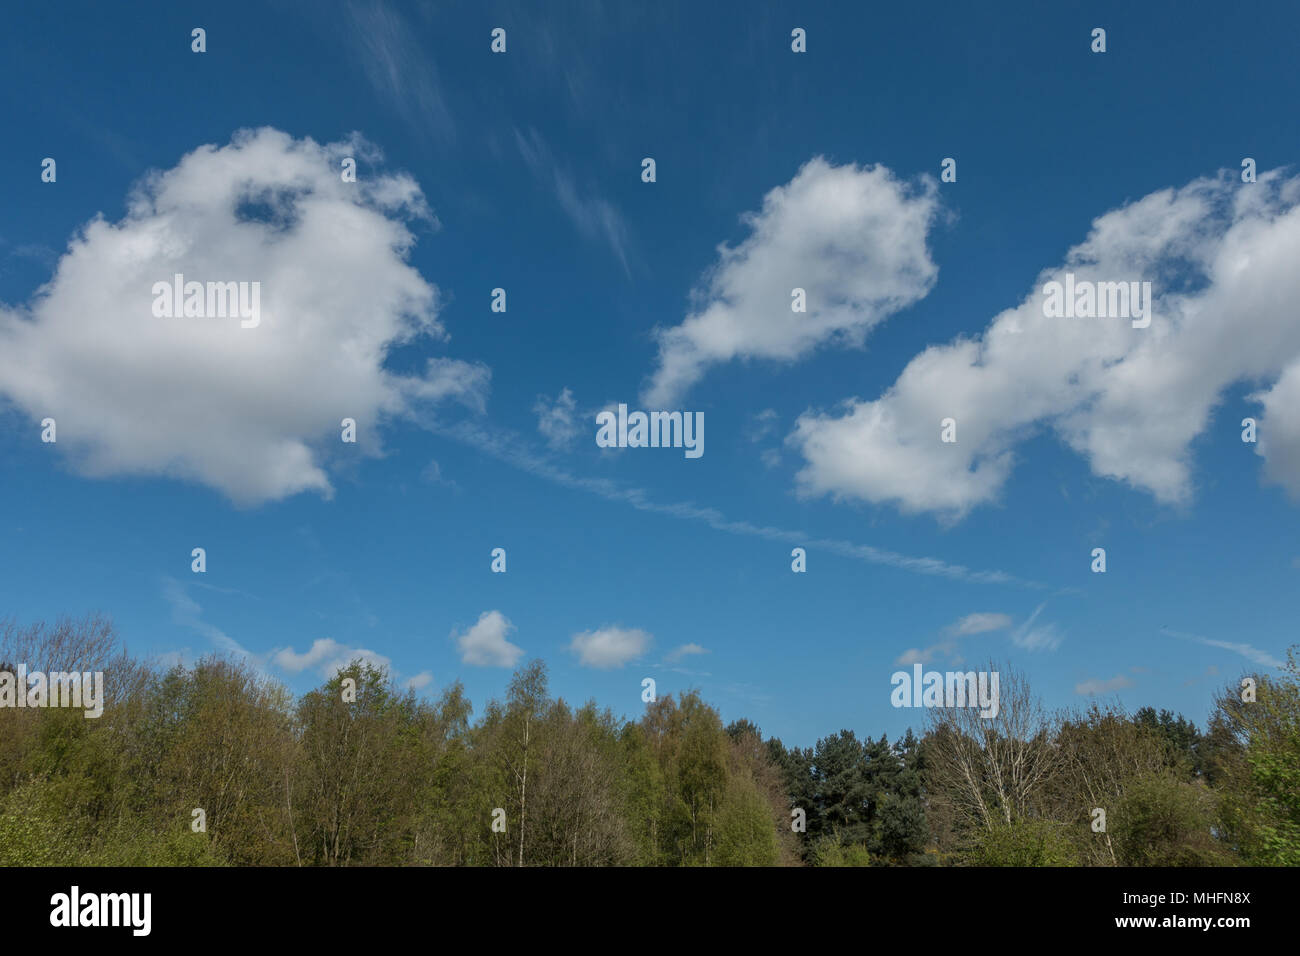 fluffy clouds amongst beautiful blue skies - Stock Image